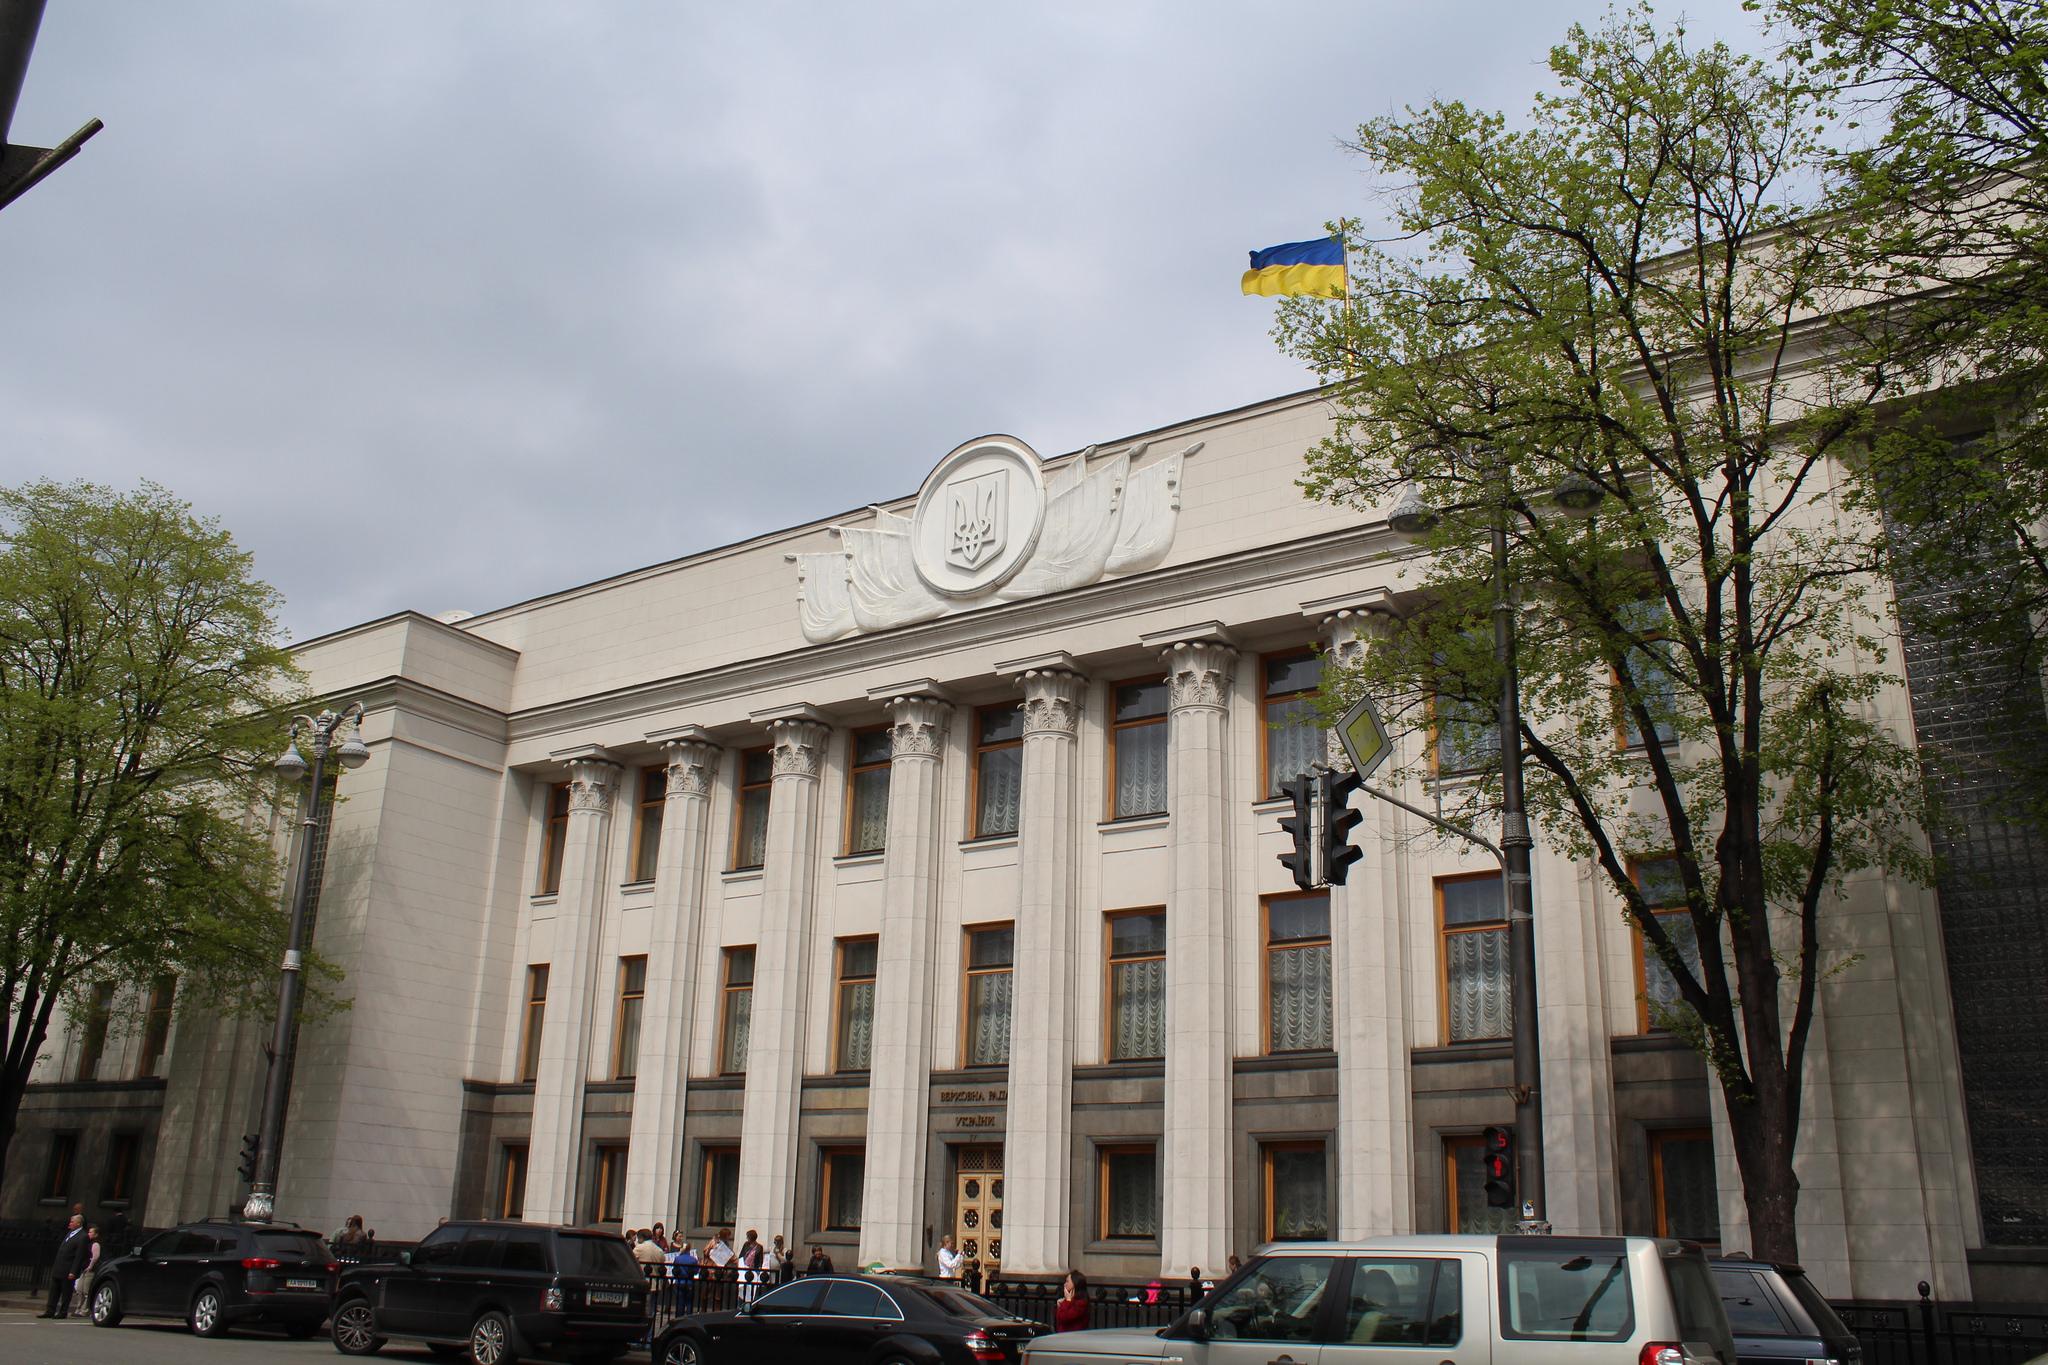 Агентура  фиксирует украинские танки иартиллерию вблизи границ разграничения— В «ДНР» истерика